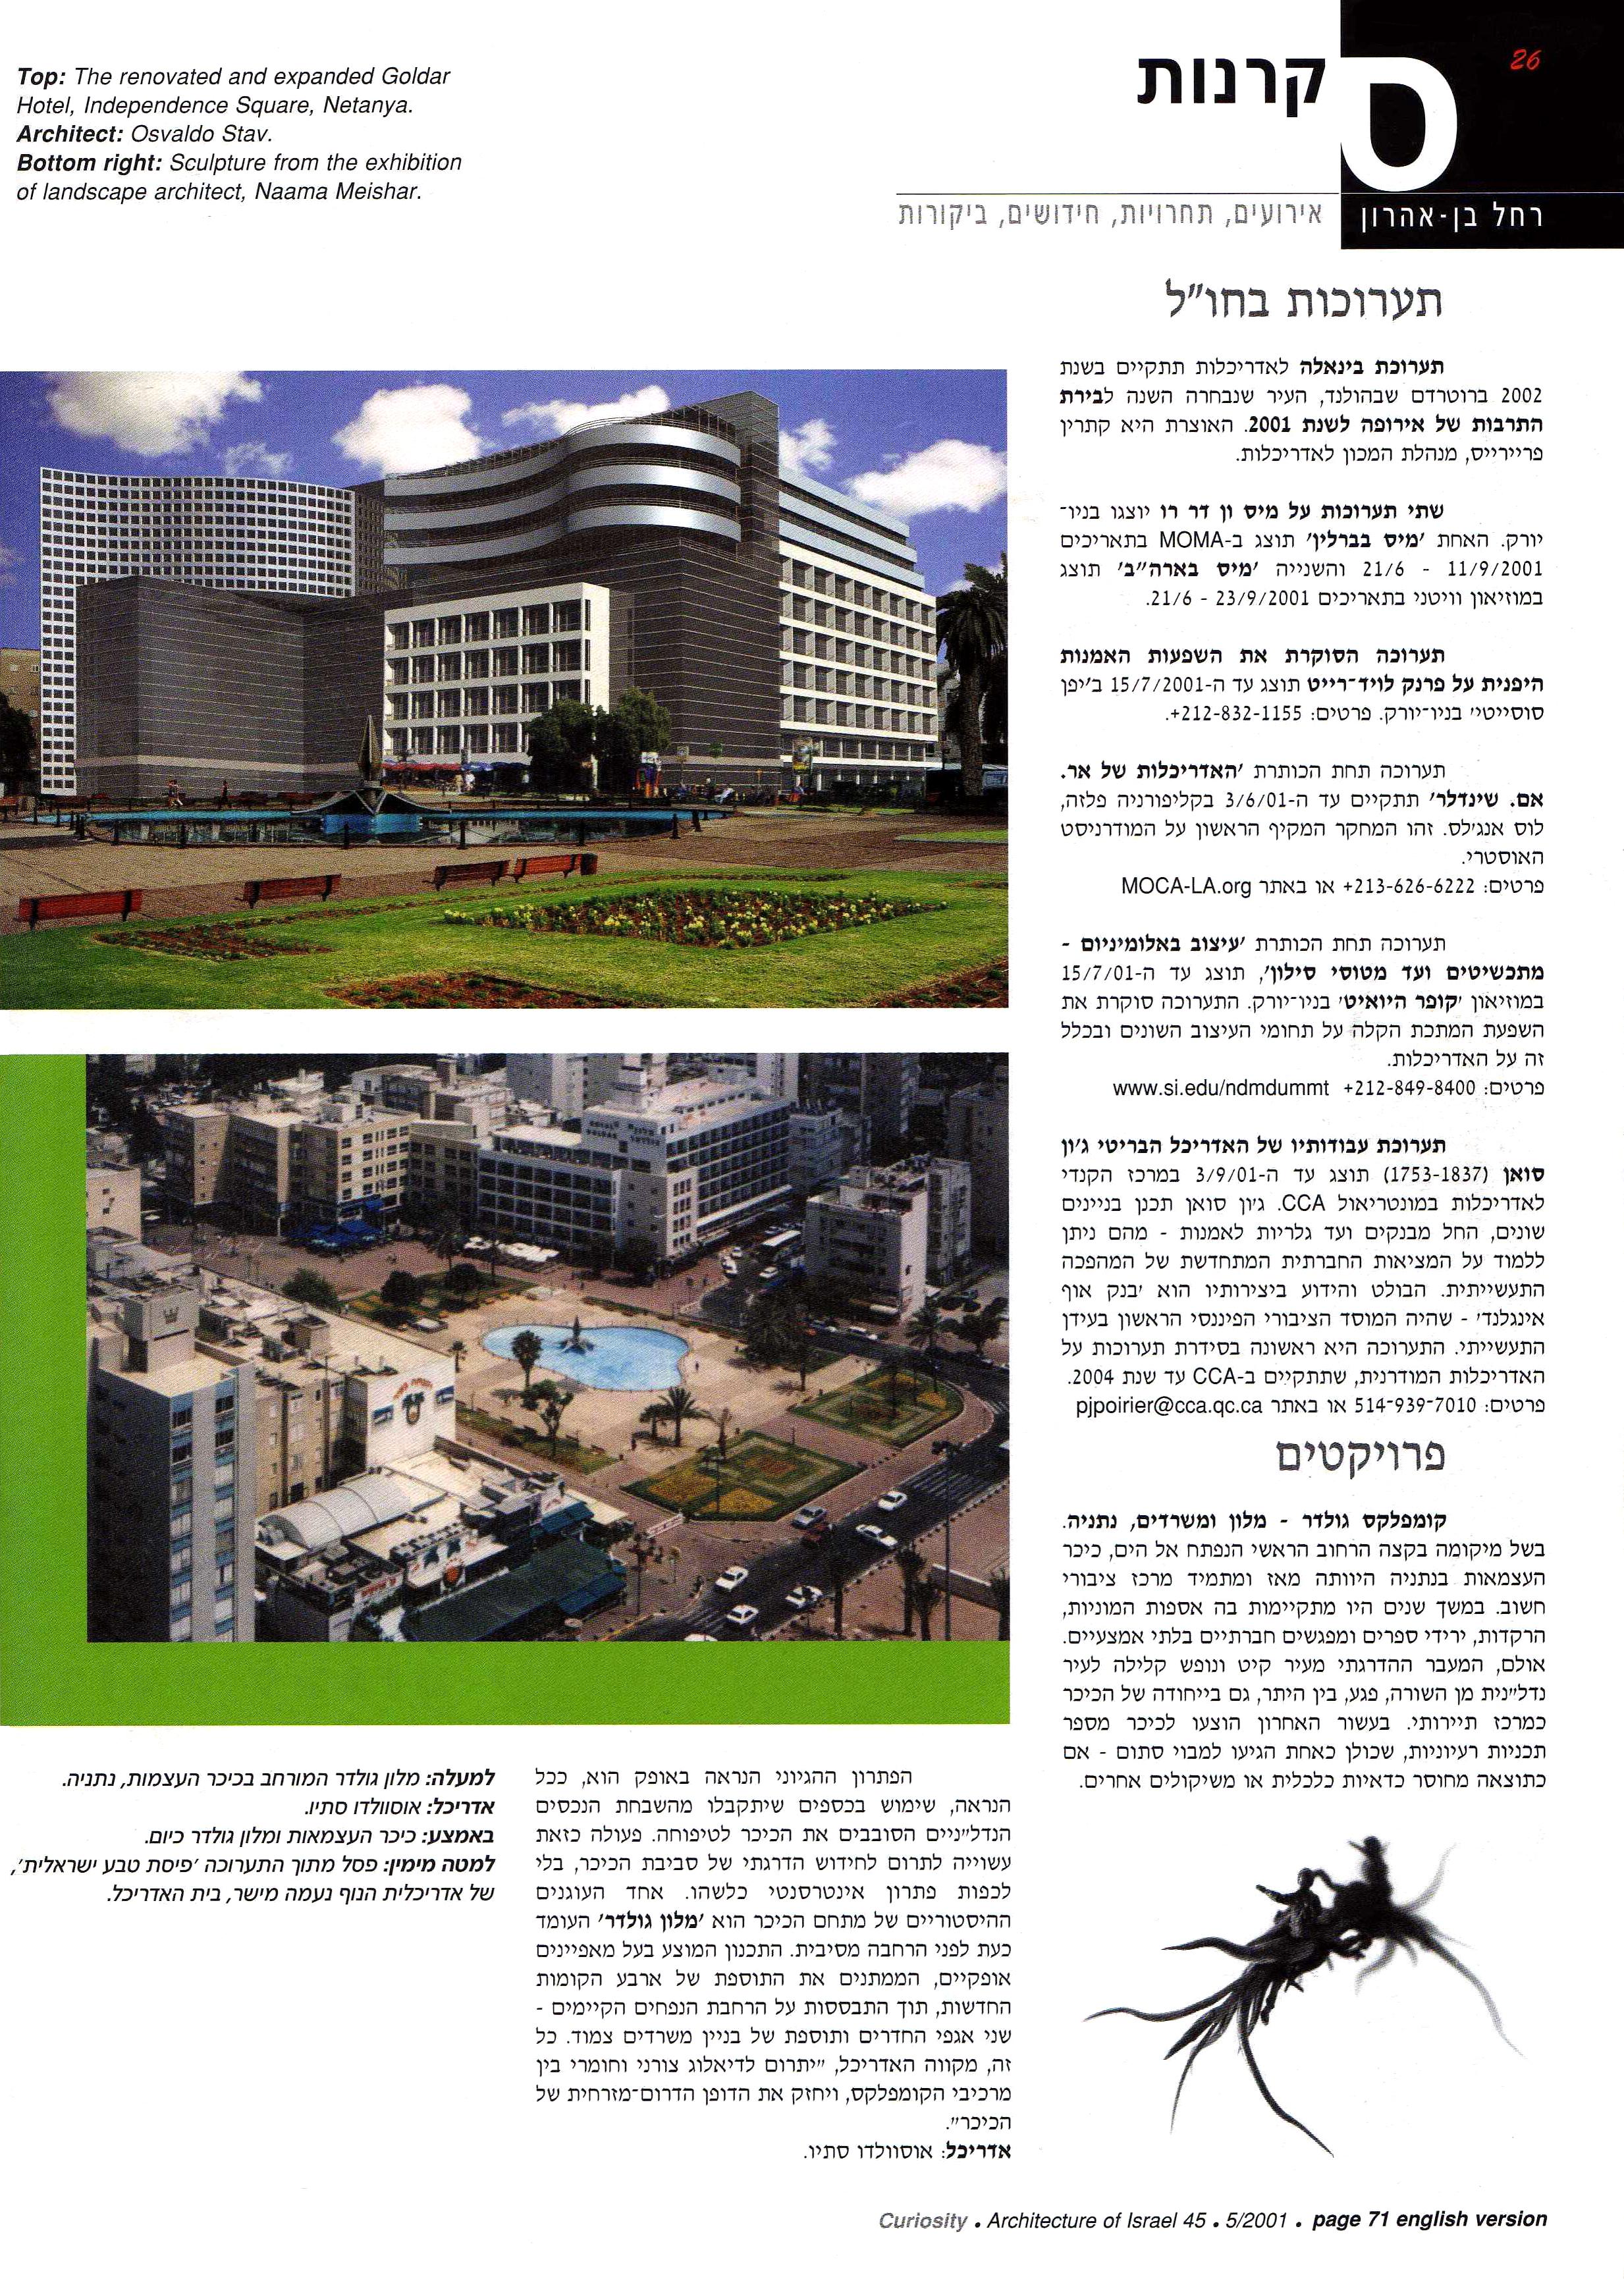 Goldar Hotel - Netanya